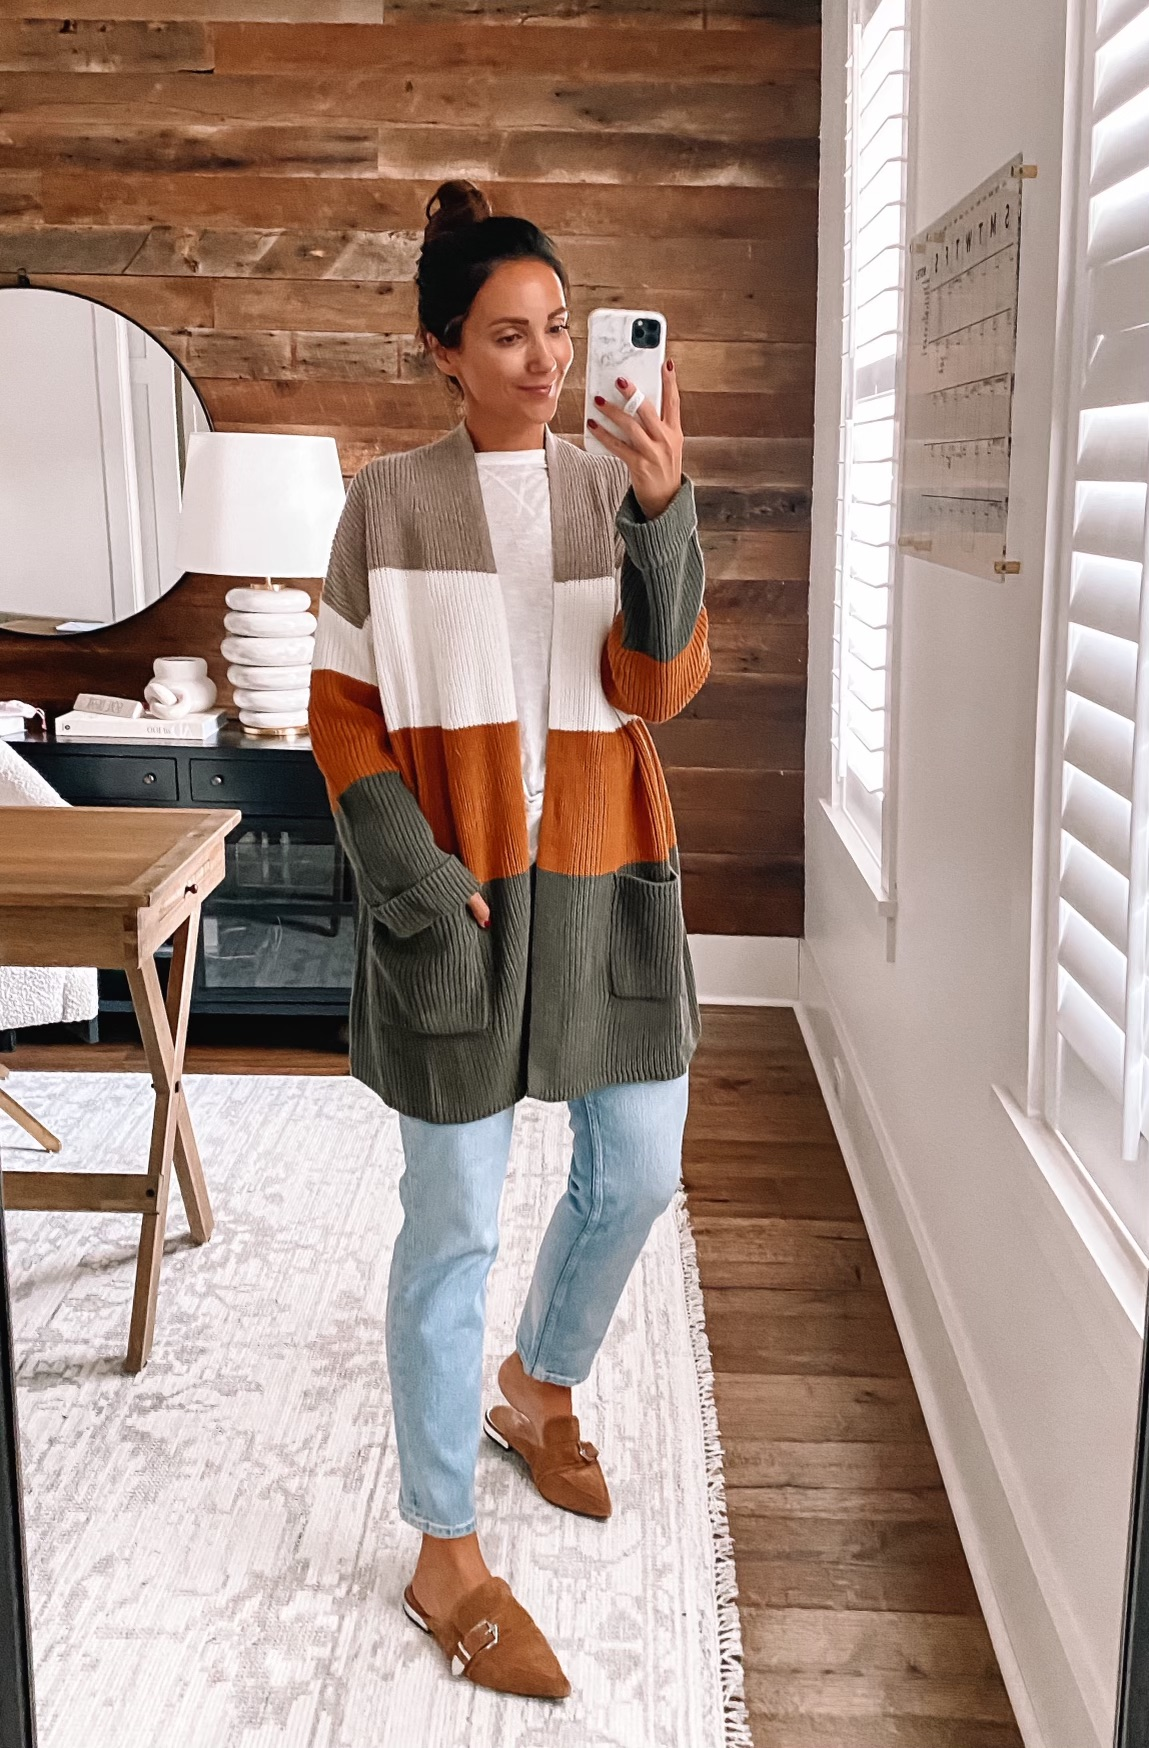 walmart fall fashion, walmart fall outfit, cardigan and jeans